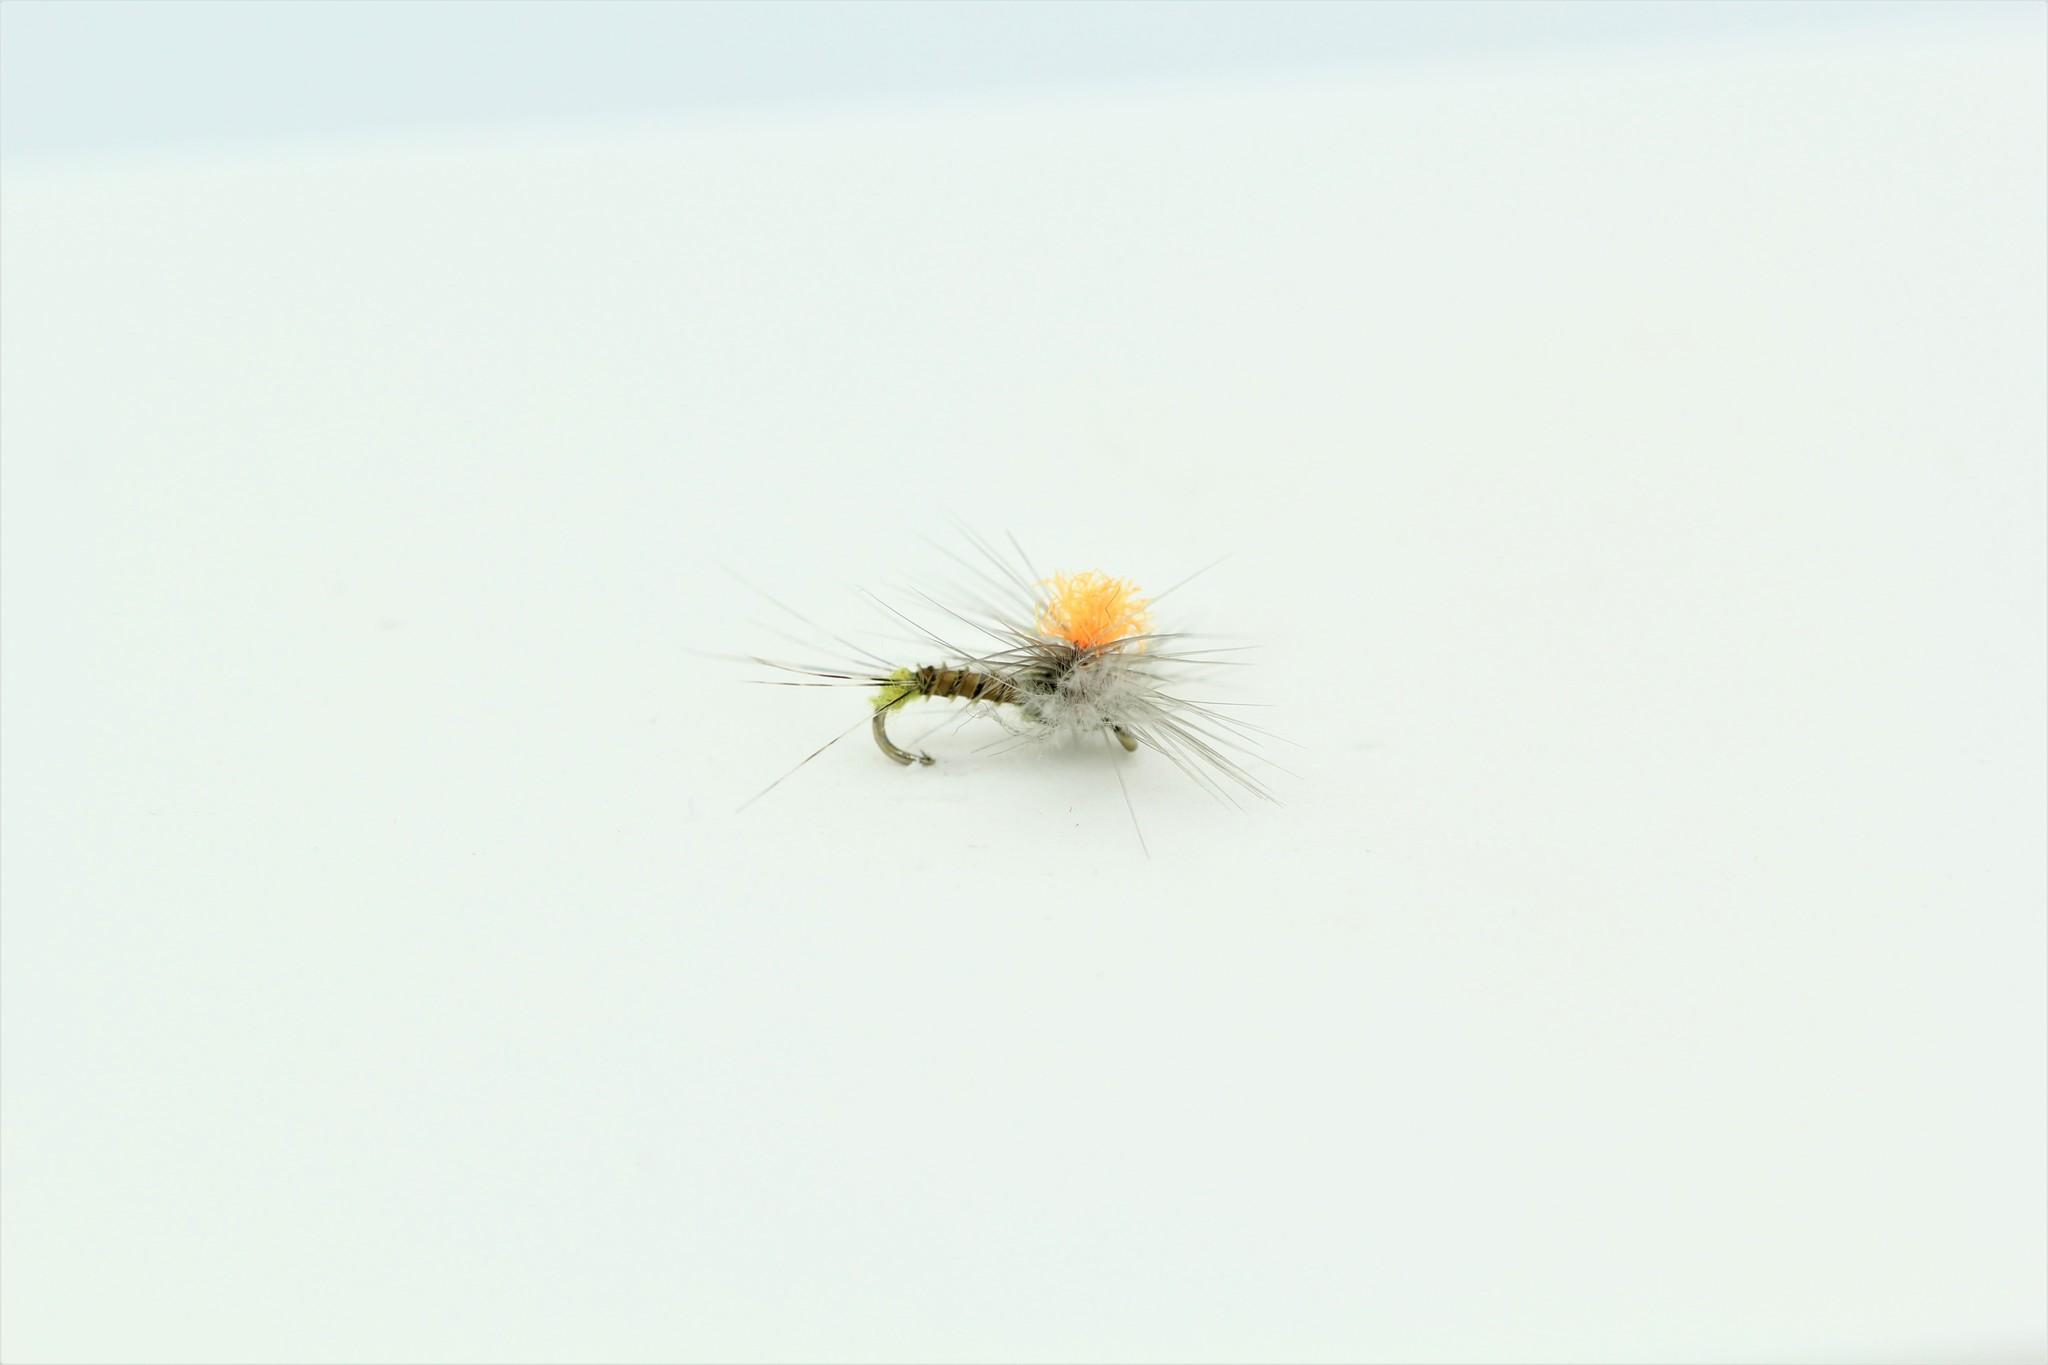 Solitude Fly Company HI-VIS SPINNER BWO